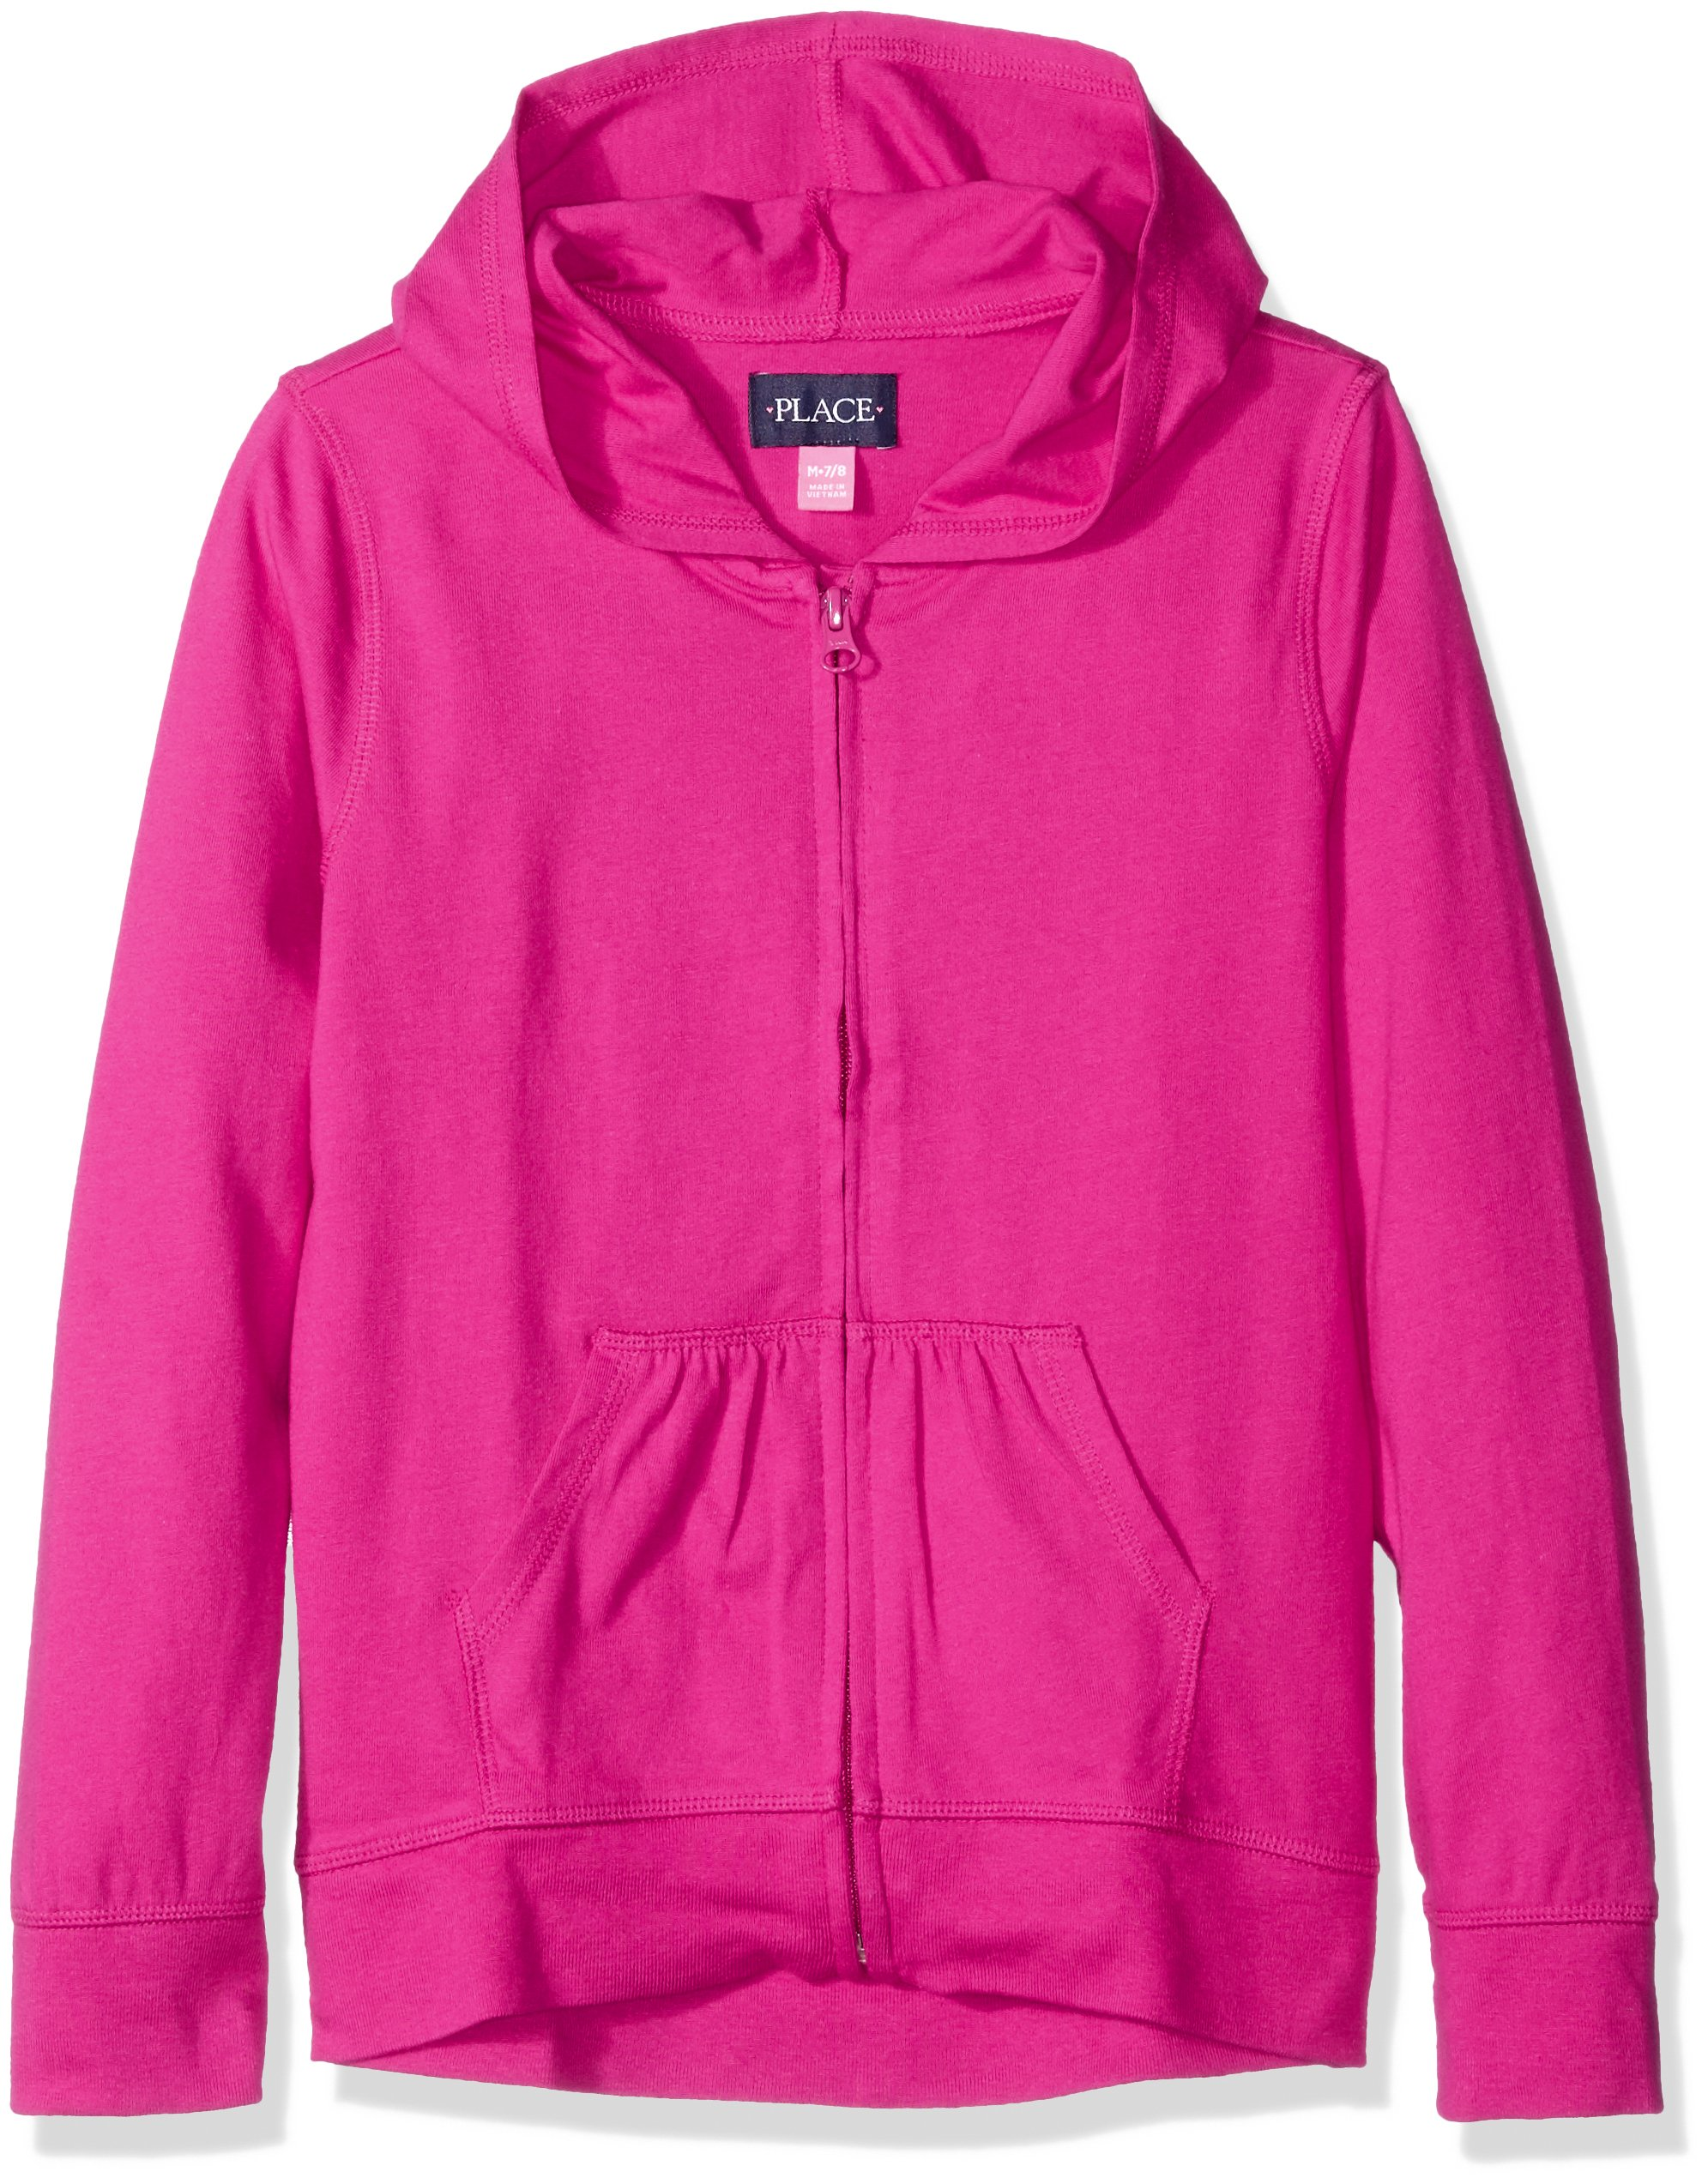 The Children's Place Girls' Little Uniform High-Low Hoodie, Aurora Pink, Small/5/6